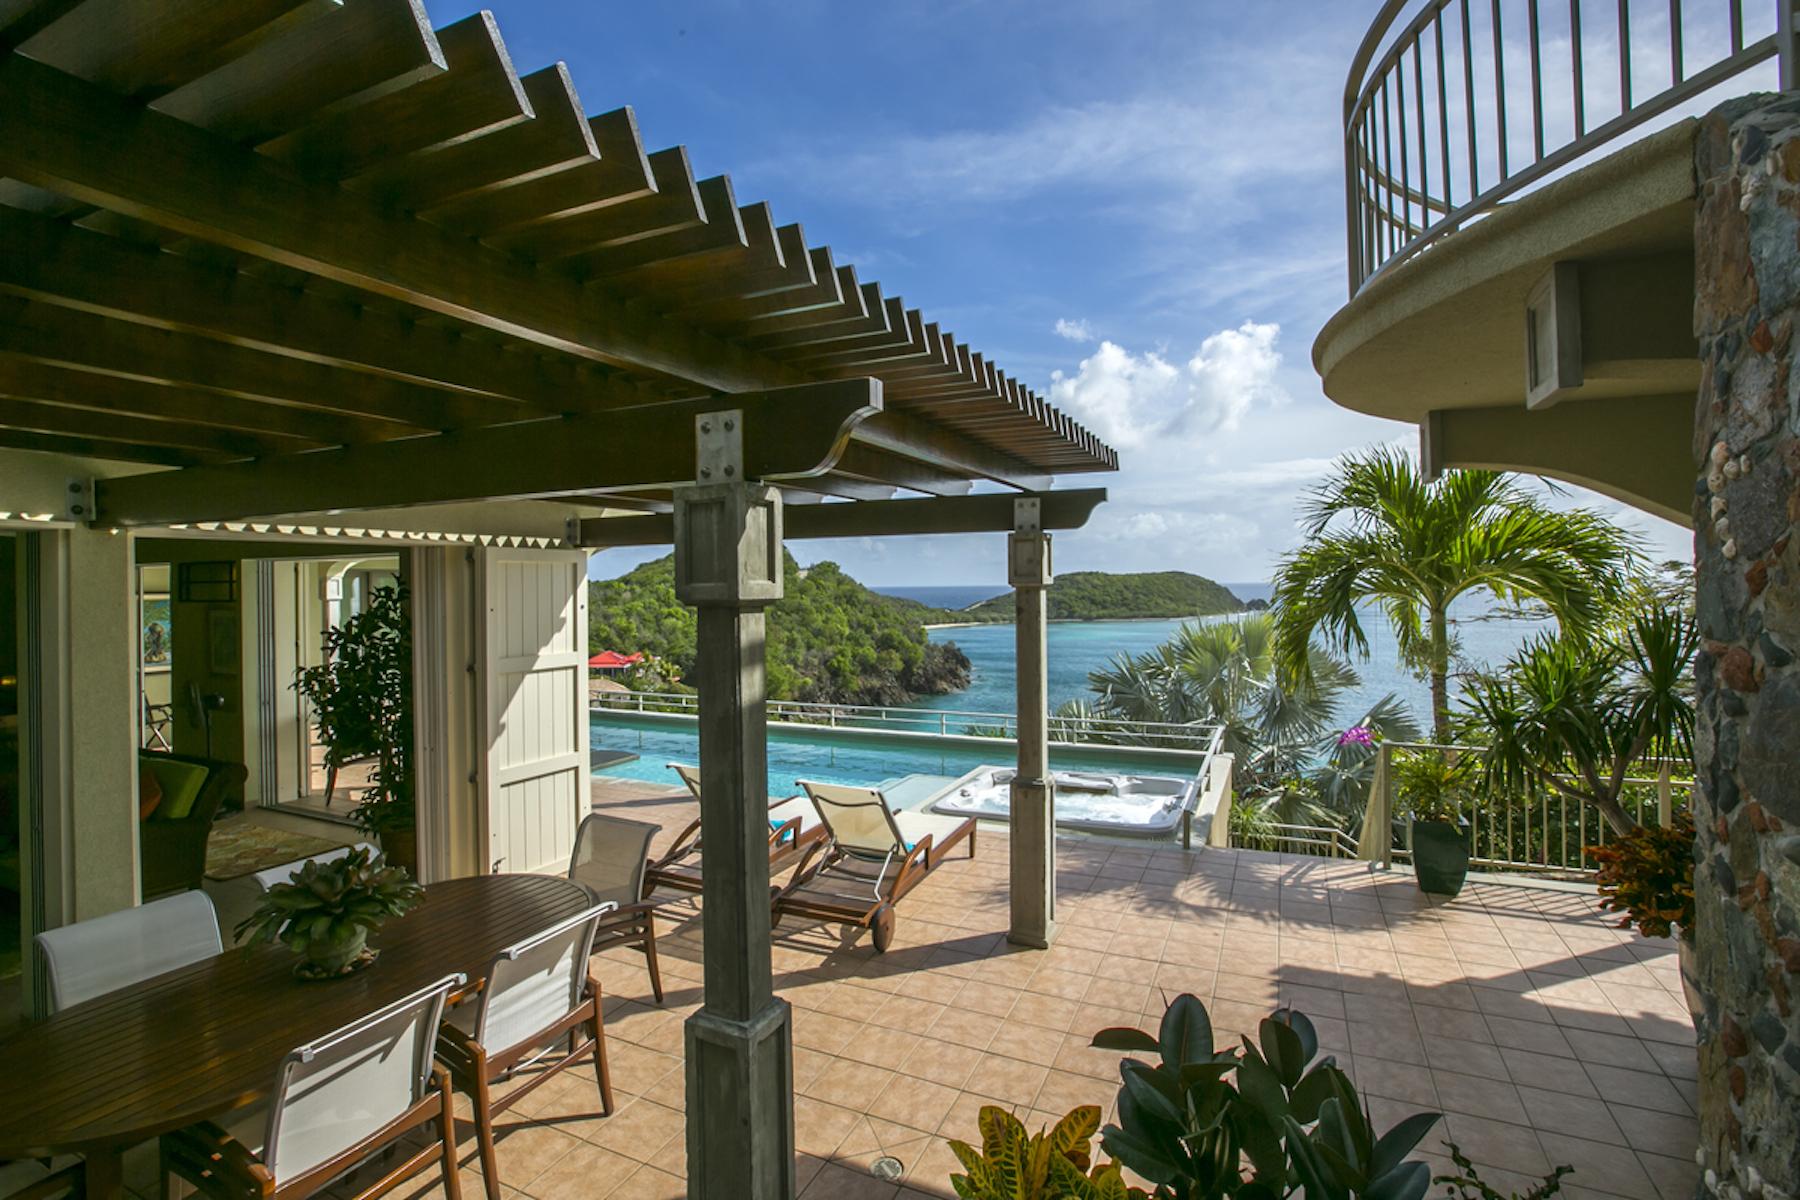 Single Family Homes für Verkauf beim Latitude Villa 15A-7-13 Rendezvous & Ditleff St John, Virgin Islands 00830 Amerikanische Jungferninseln